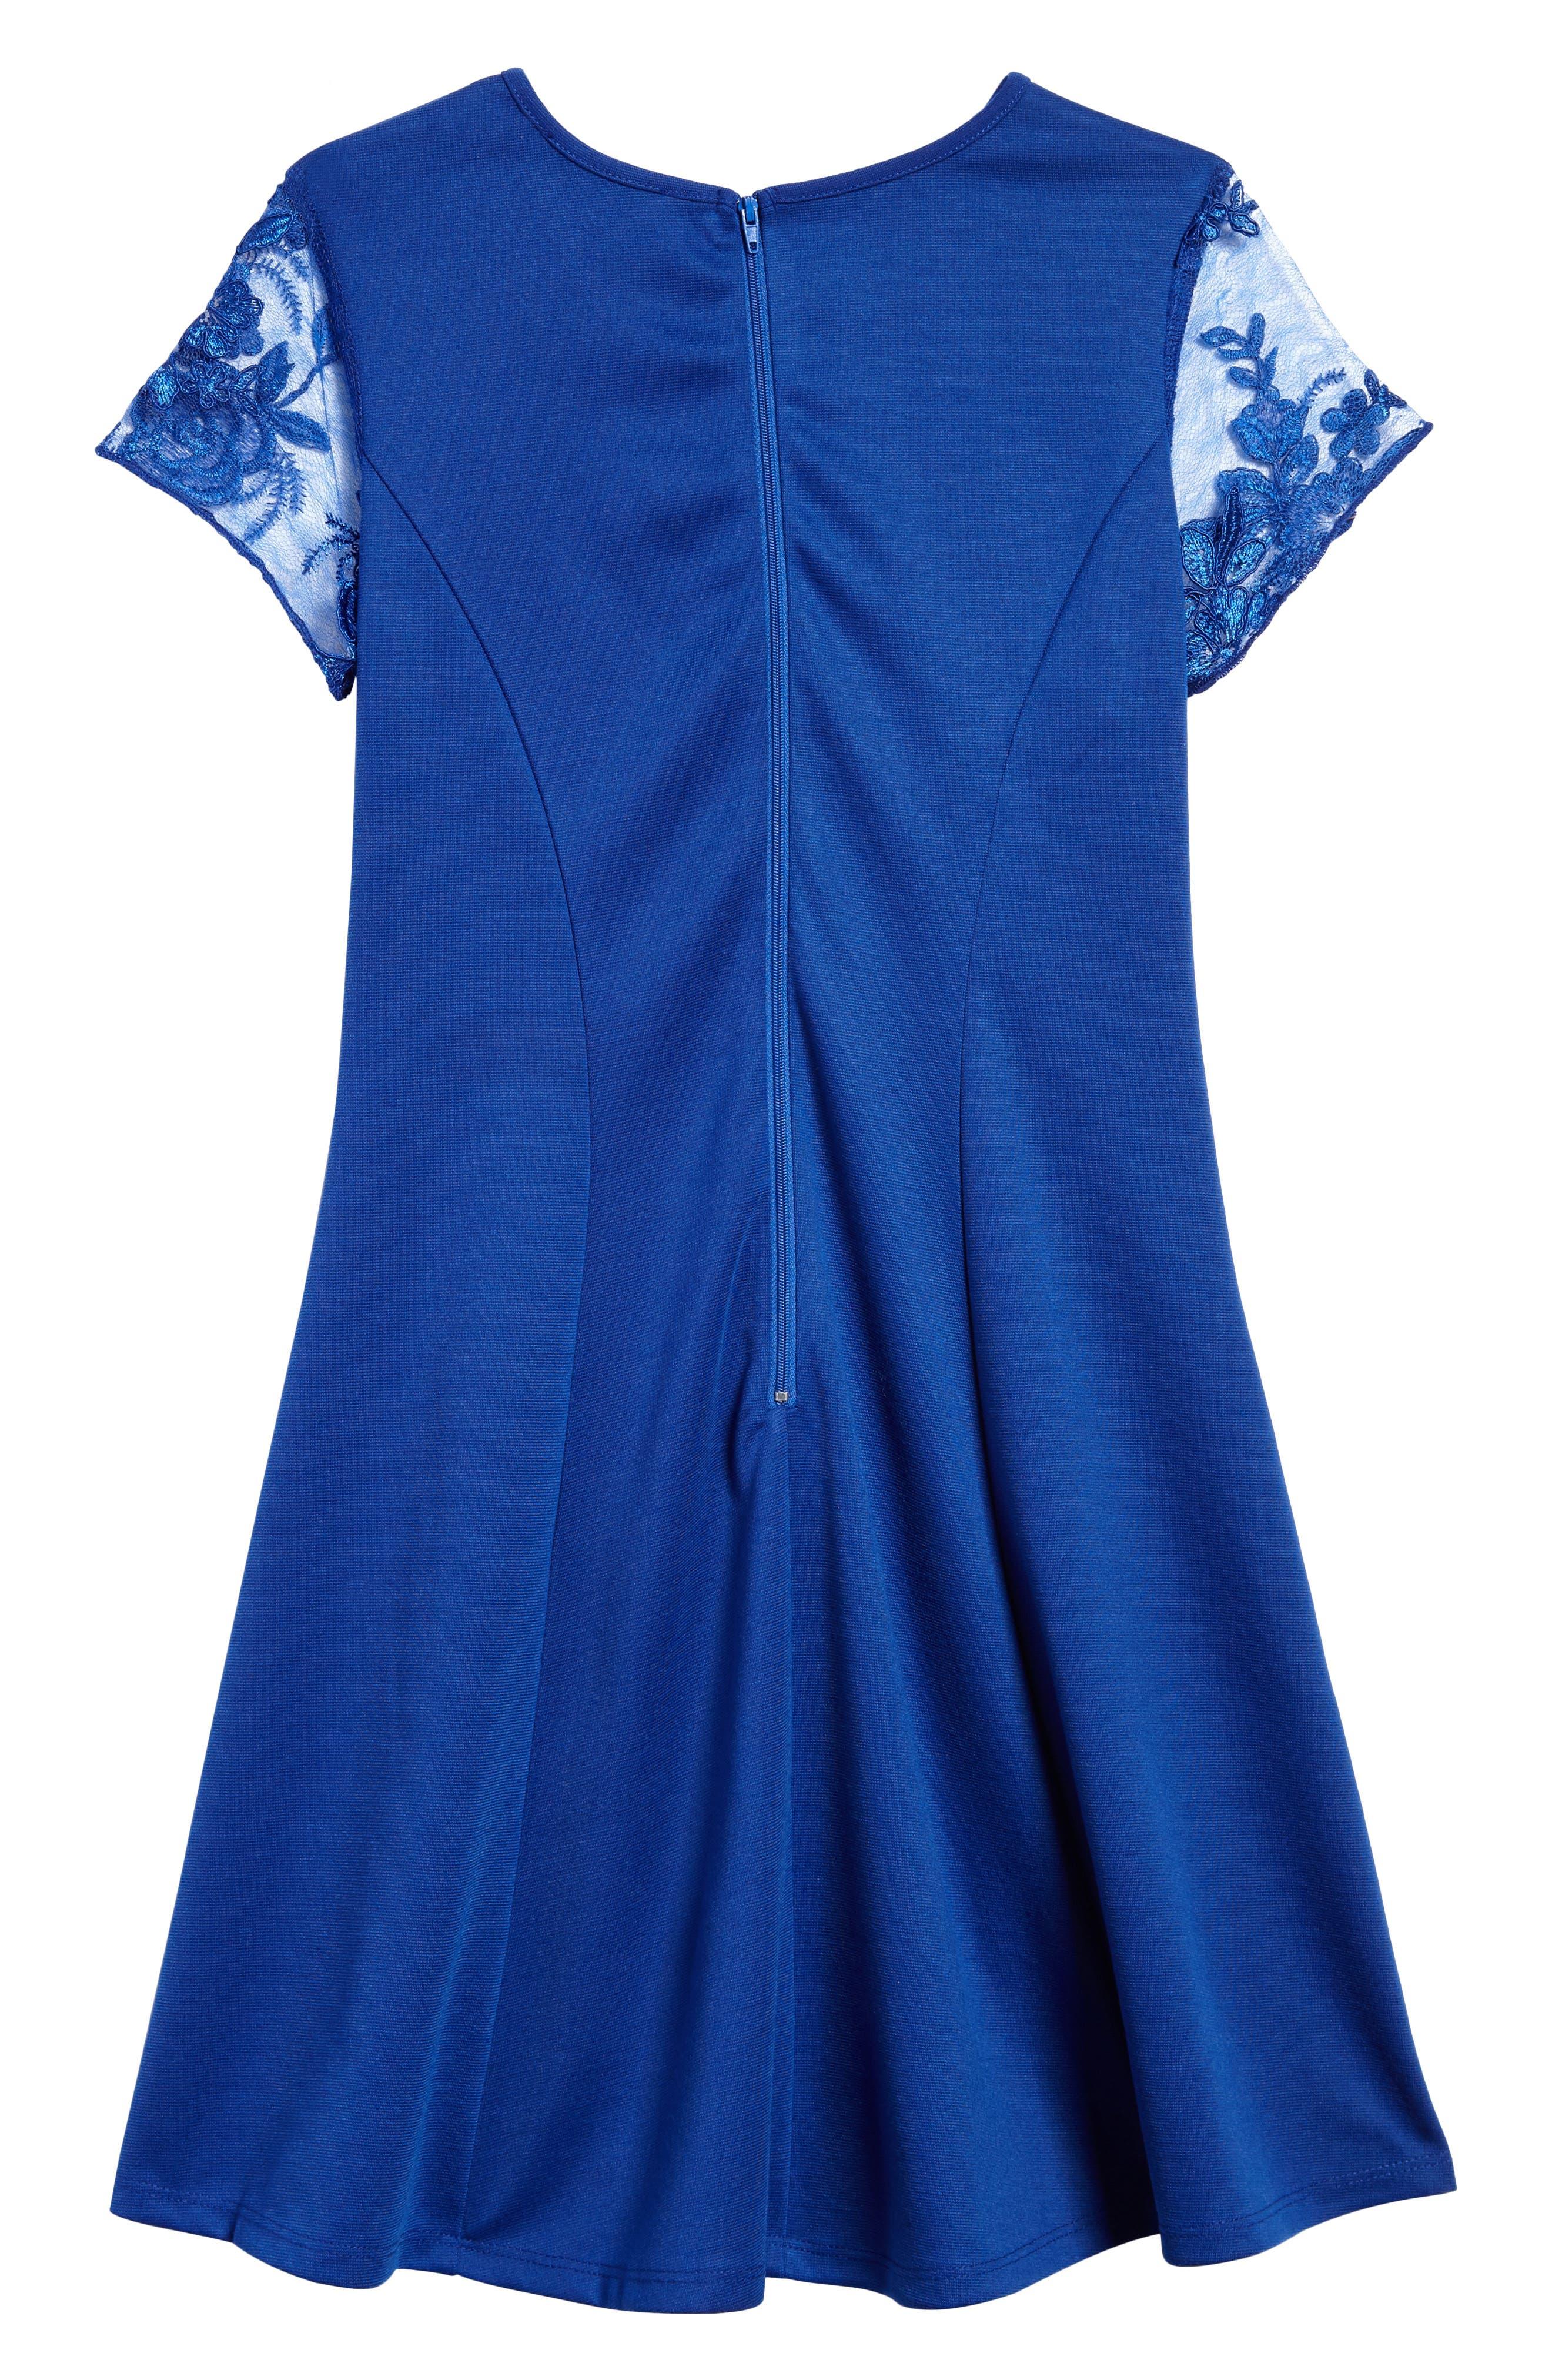 Priscilla Lace Sleeve Dress,                             Alternate thumbnail 2, color,